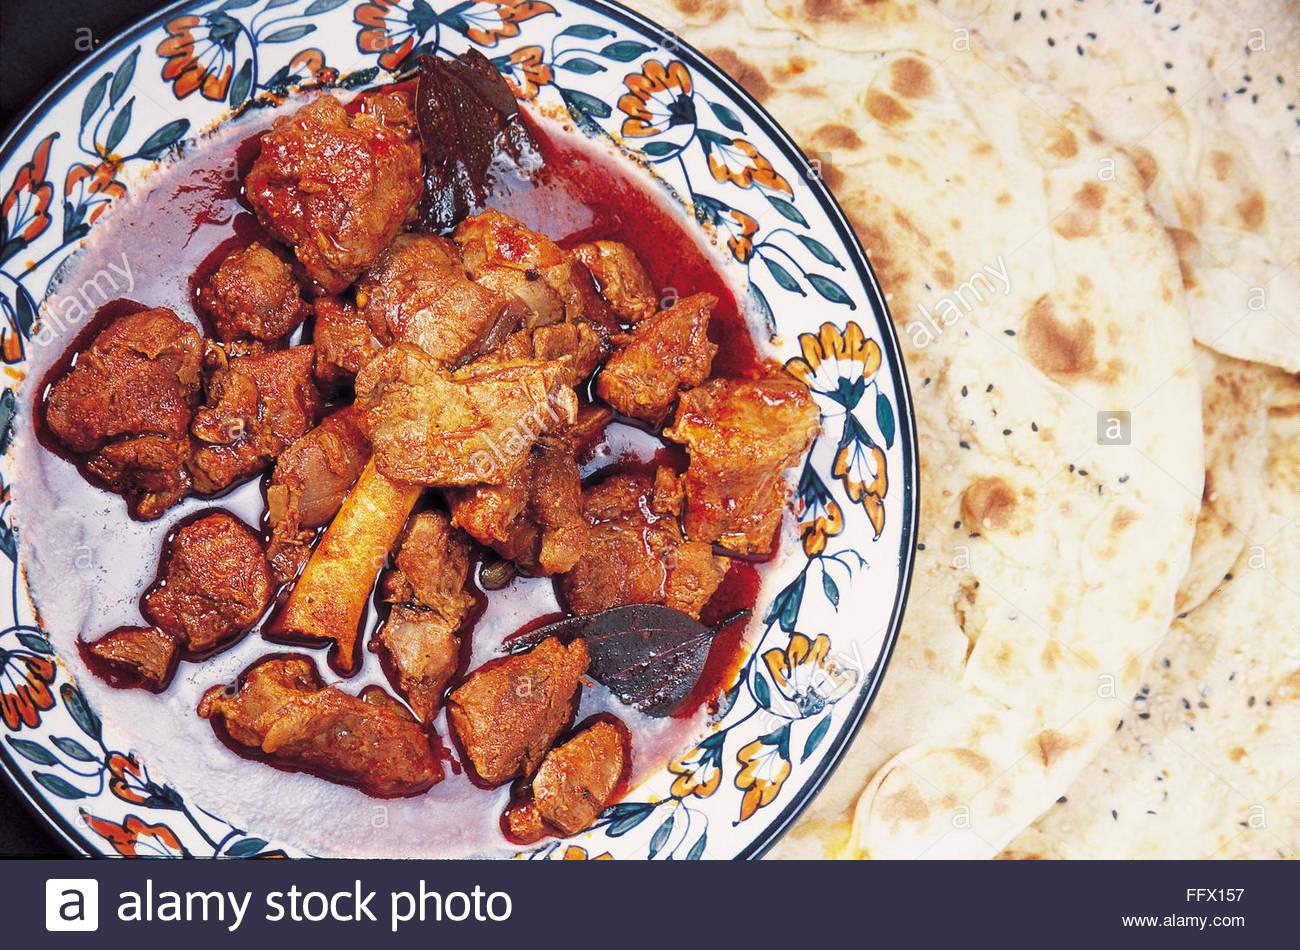 Rogan josh meat aromatic lamb dish Kashmir India - DPA ALI - Stock Image